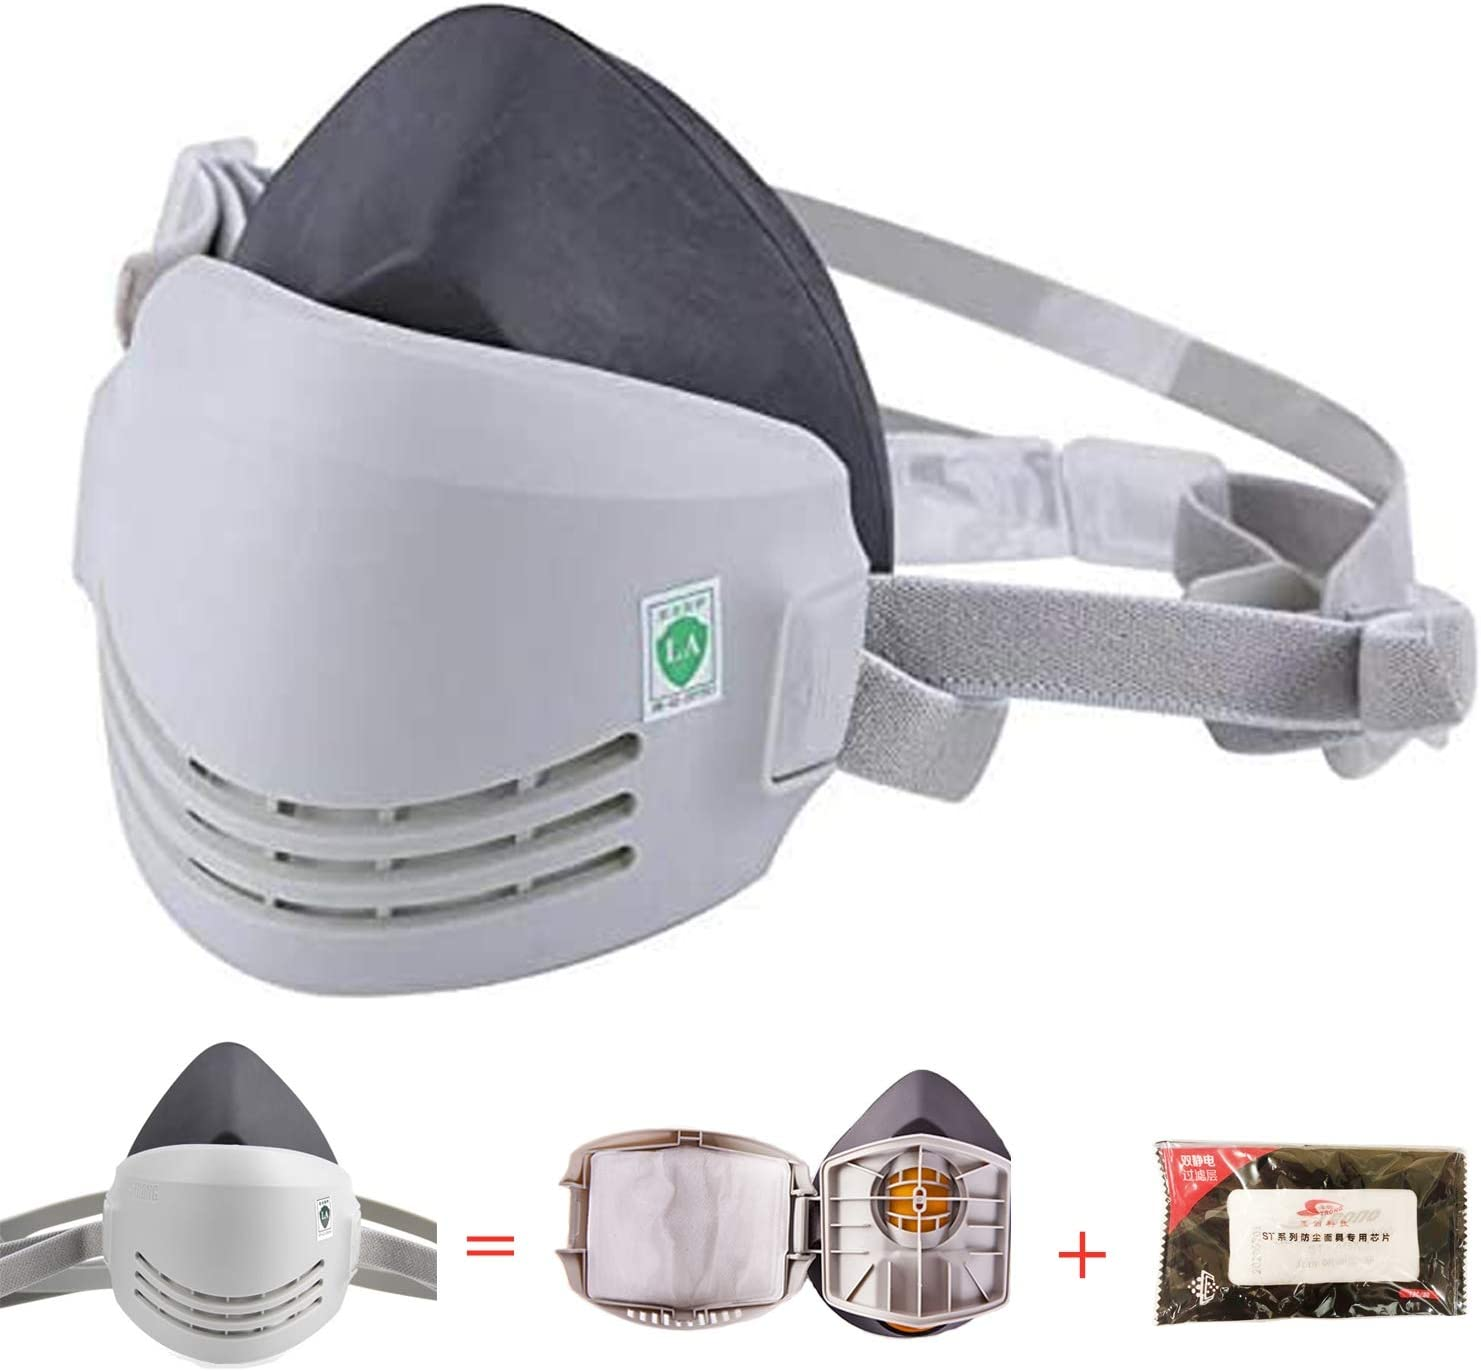 RANKSING Strong-AX Reusable Dust Half Respirator